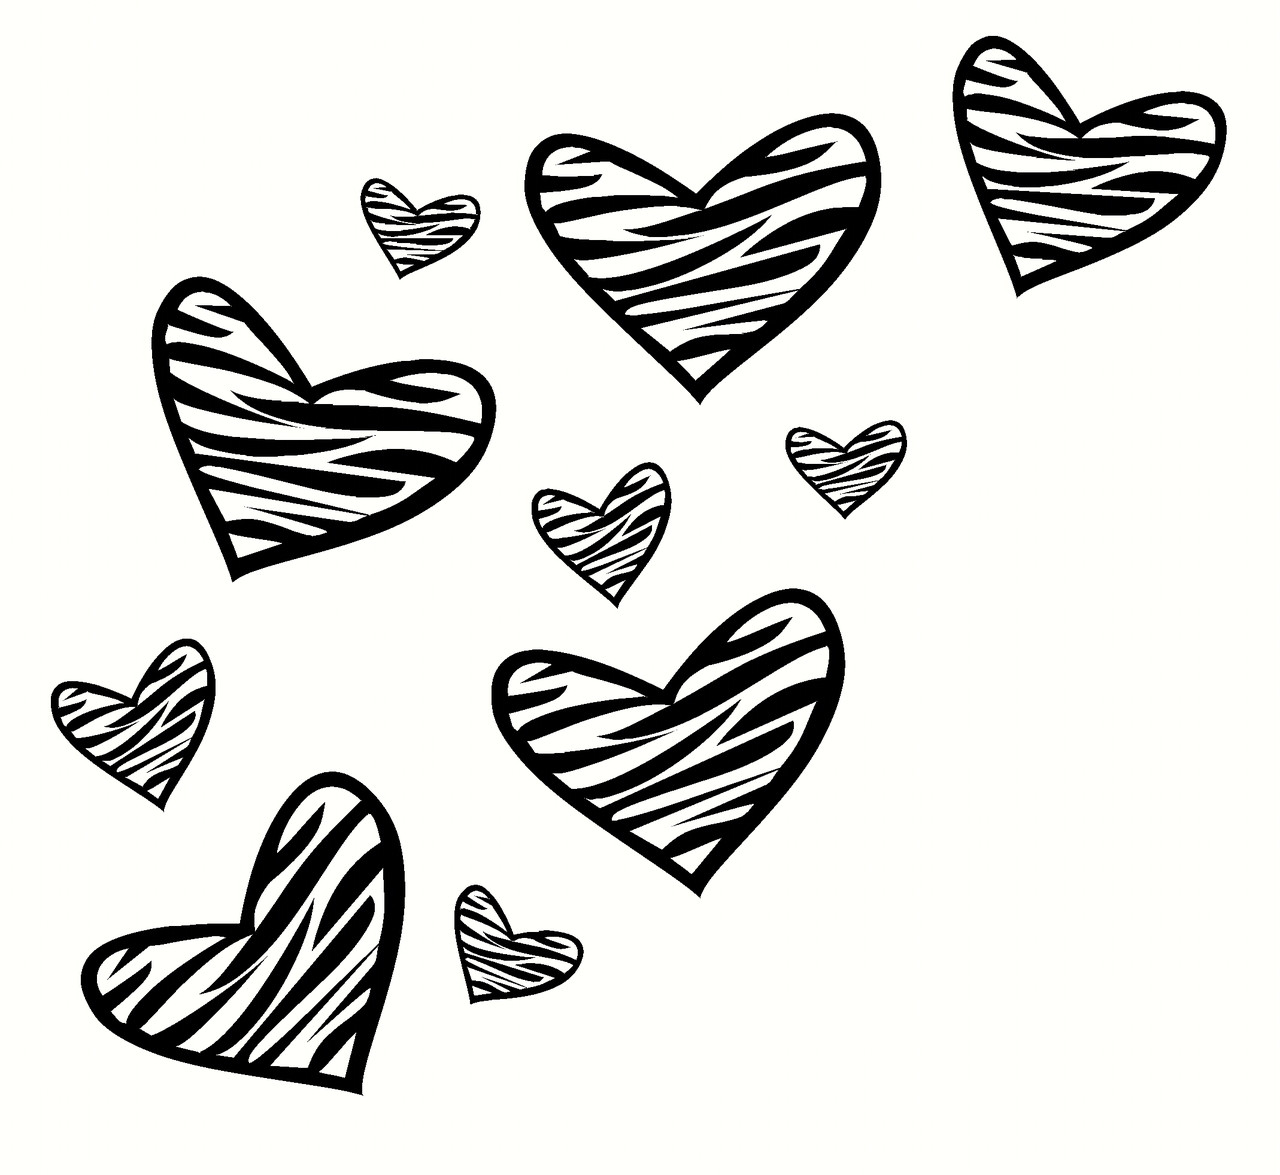 Zebra Print Heart Wall Decor Stickers 10pc